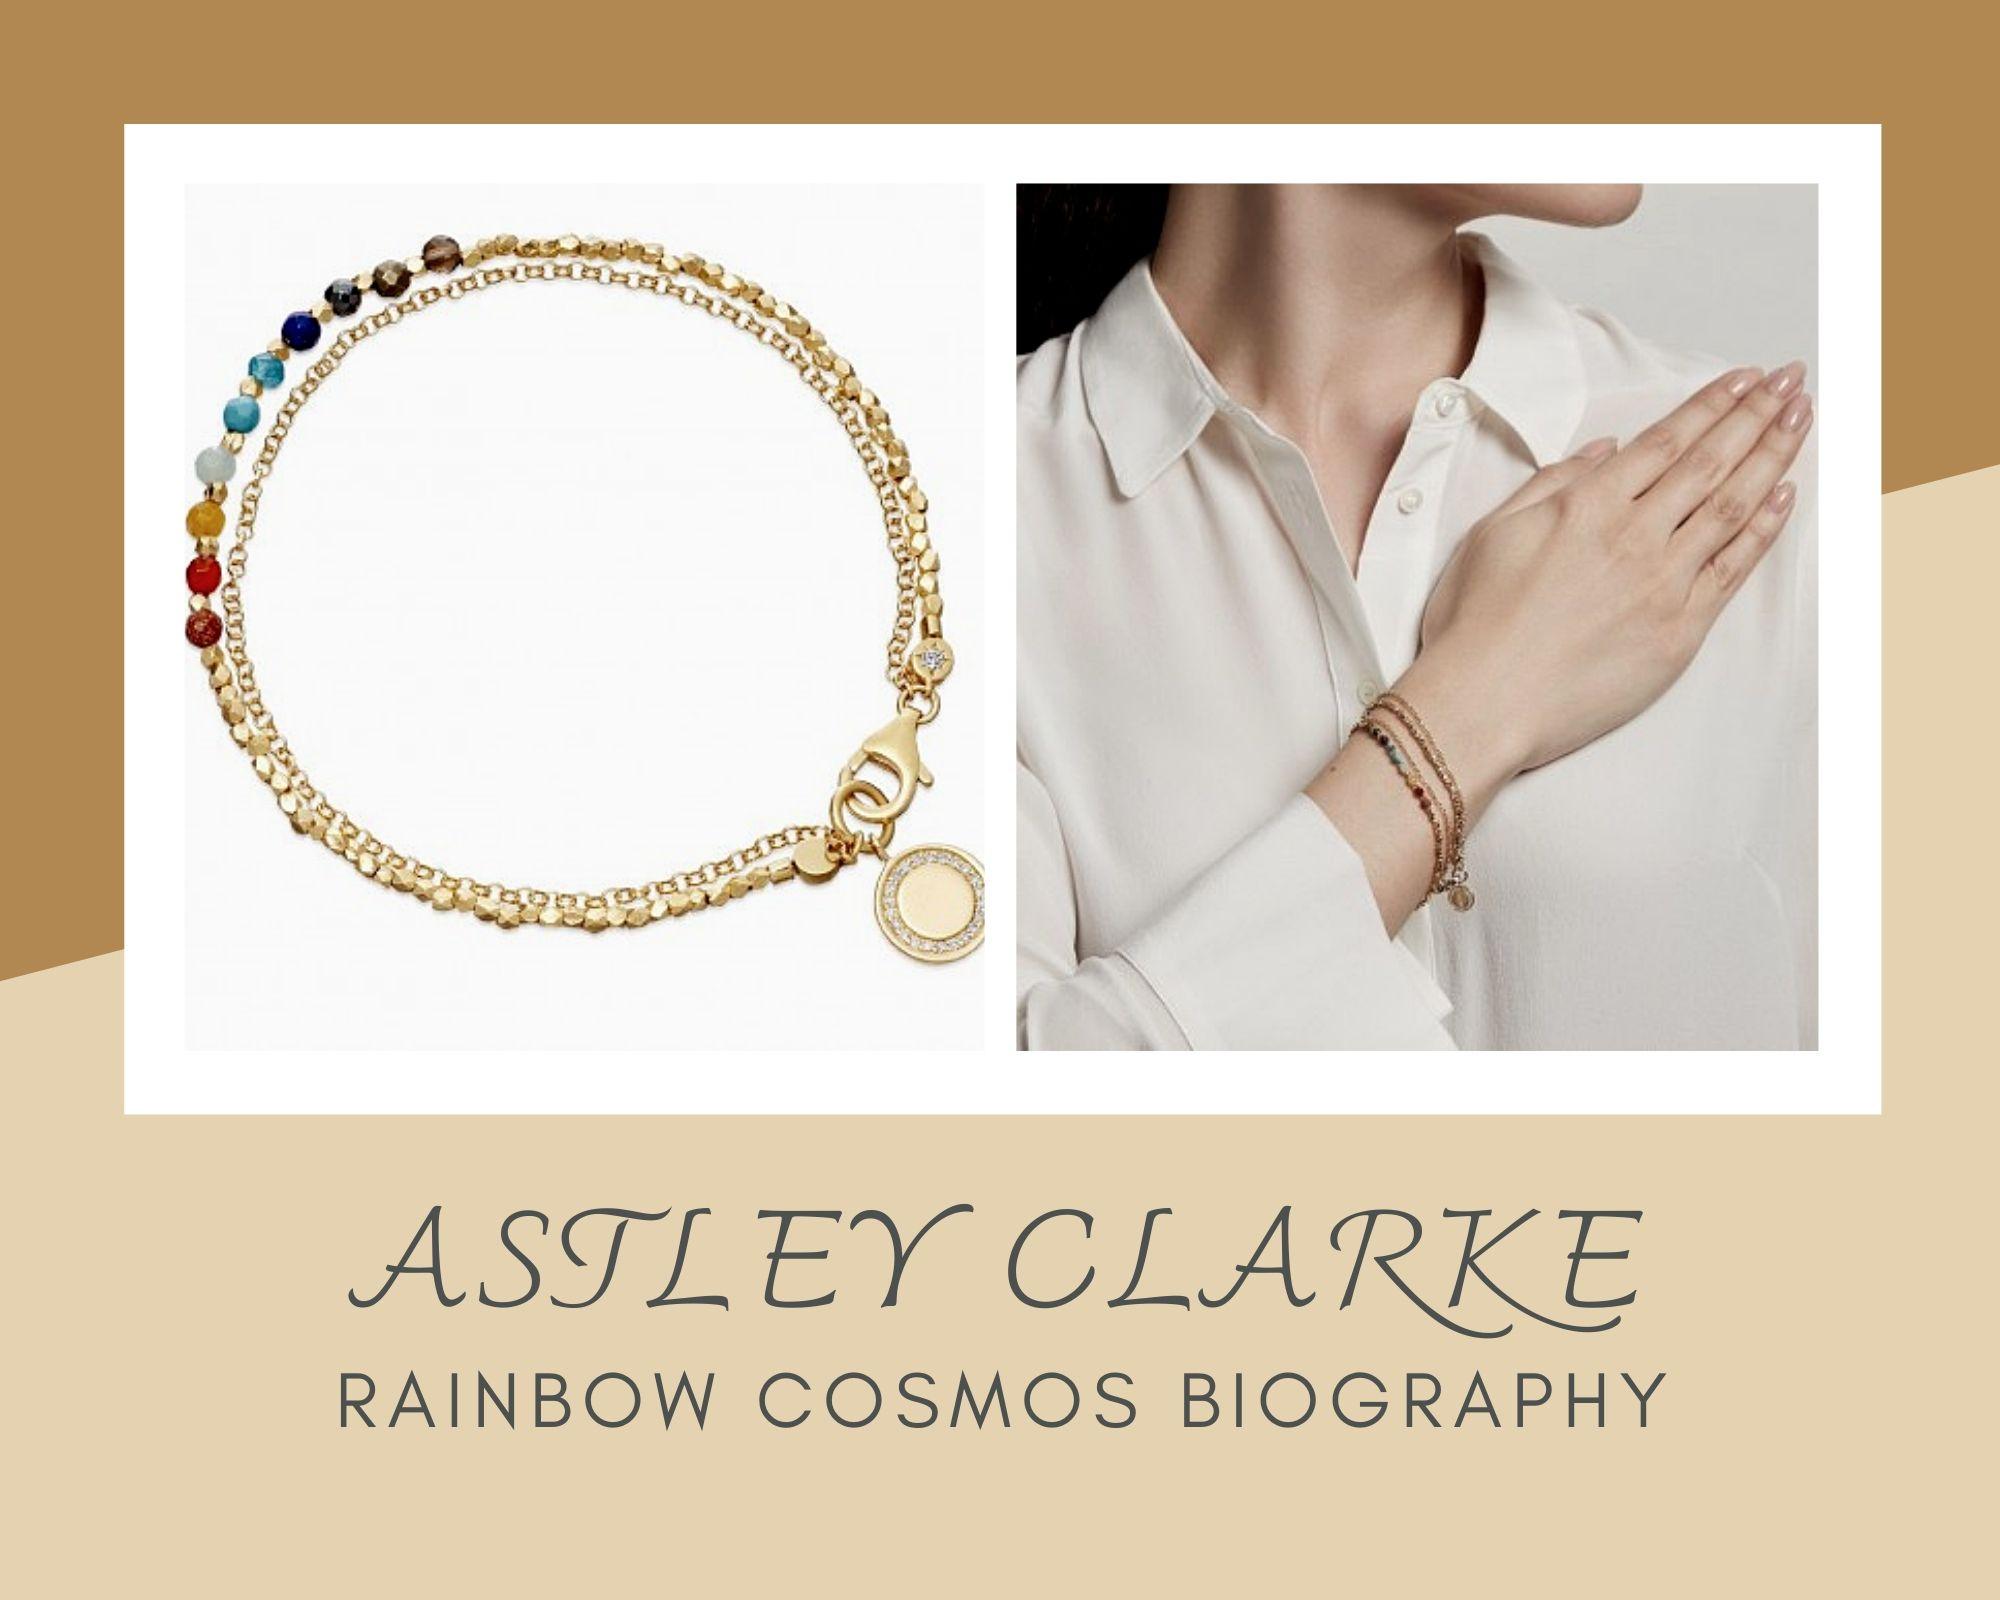 Astley Clarke Biography系列10色彩虹串珠手链